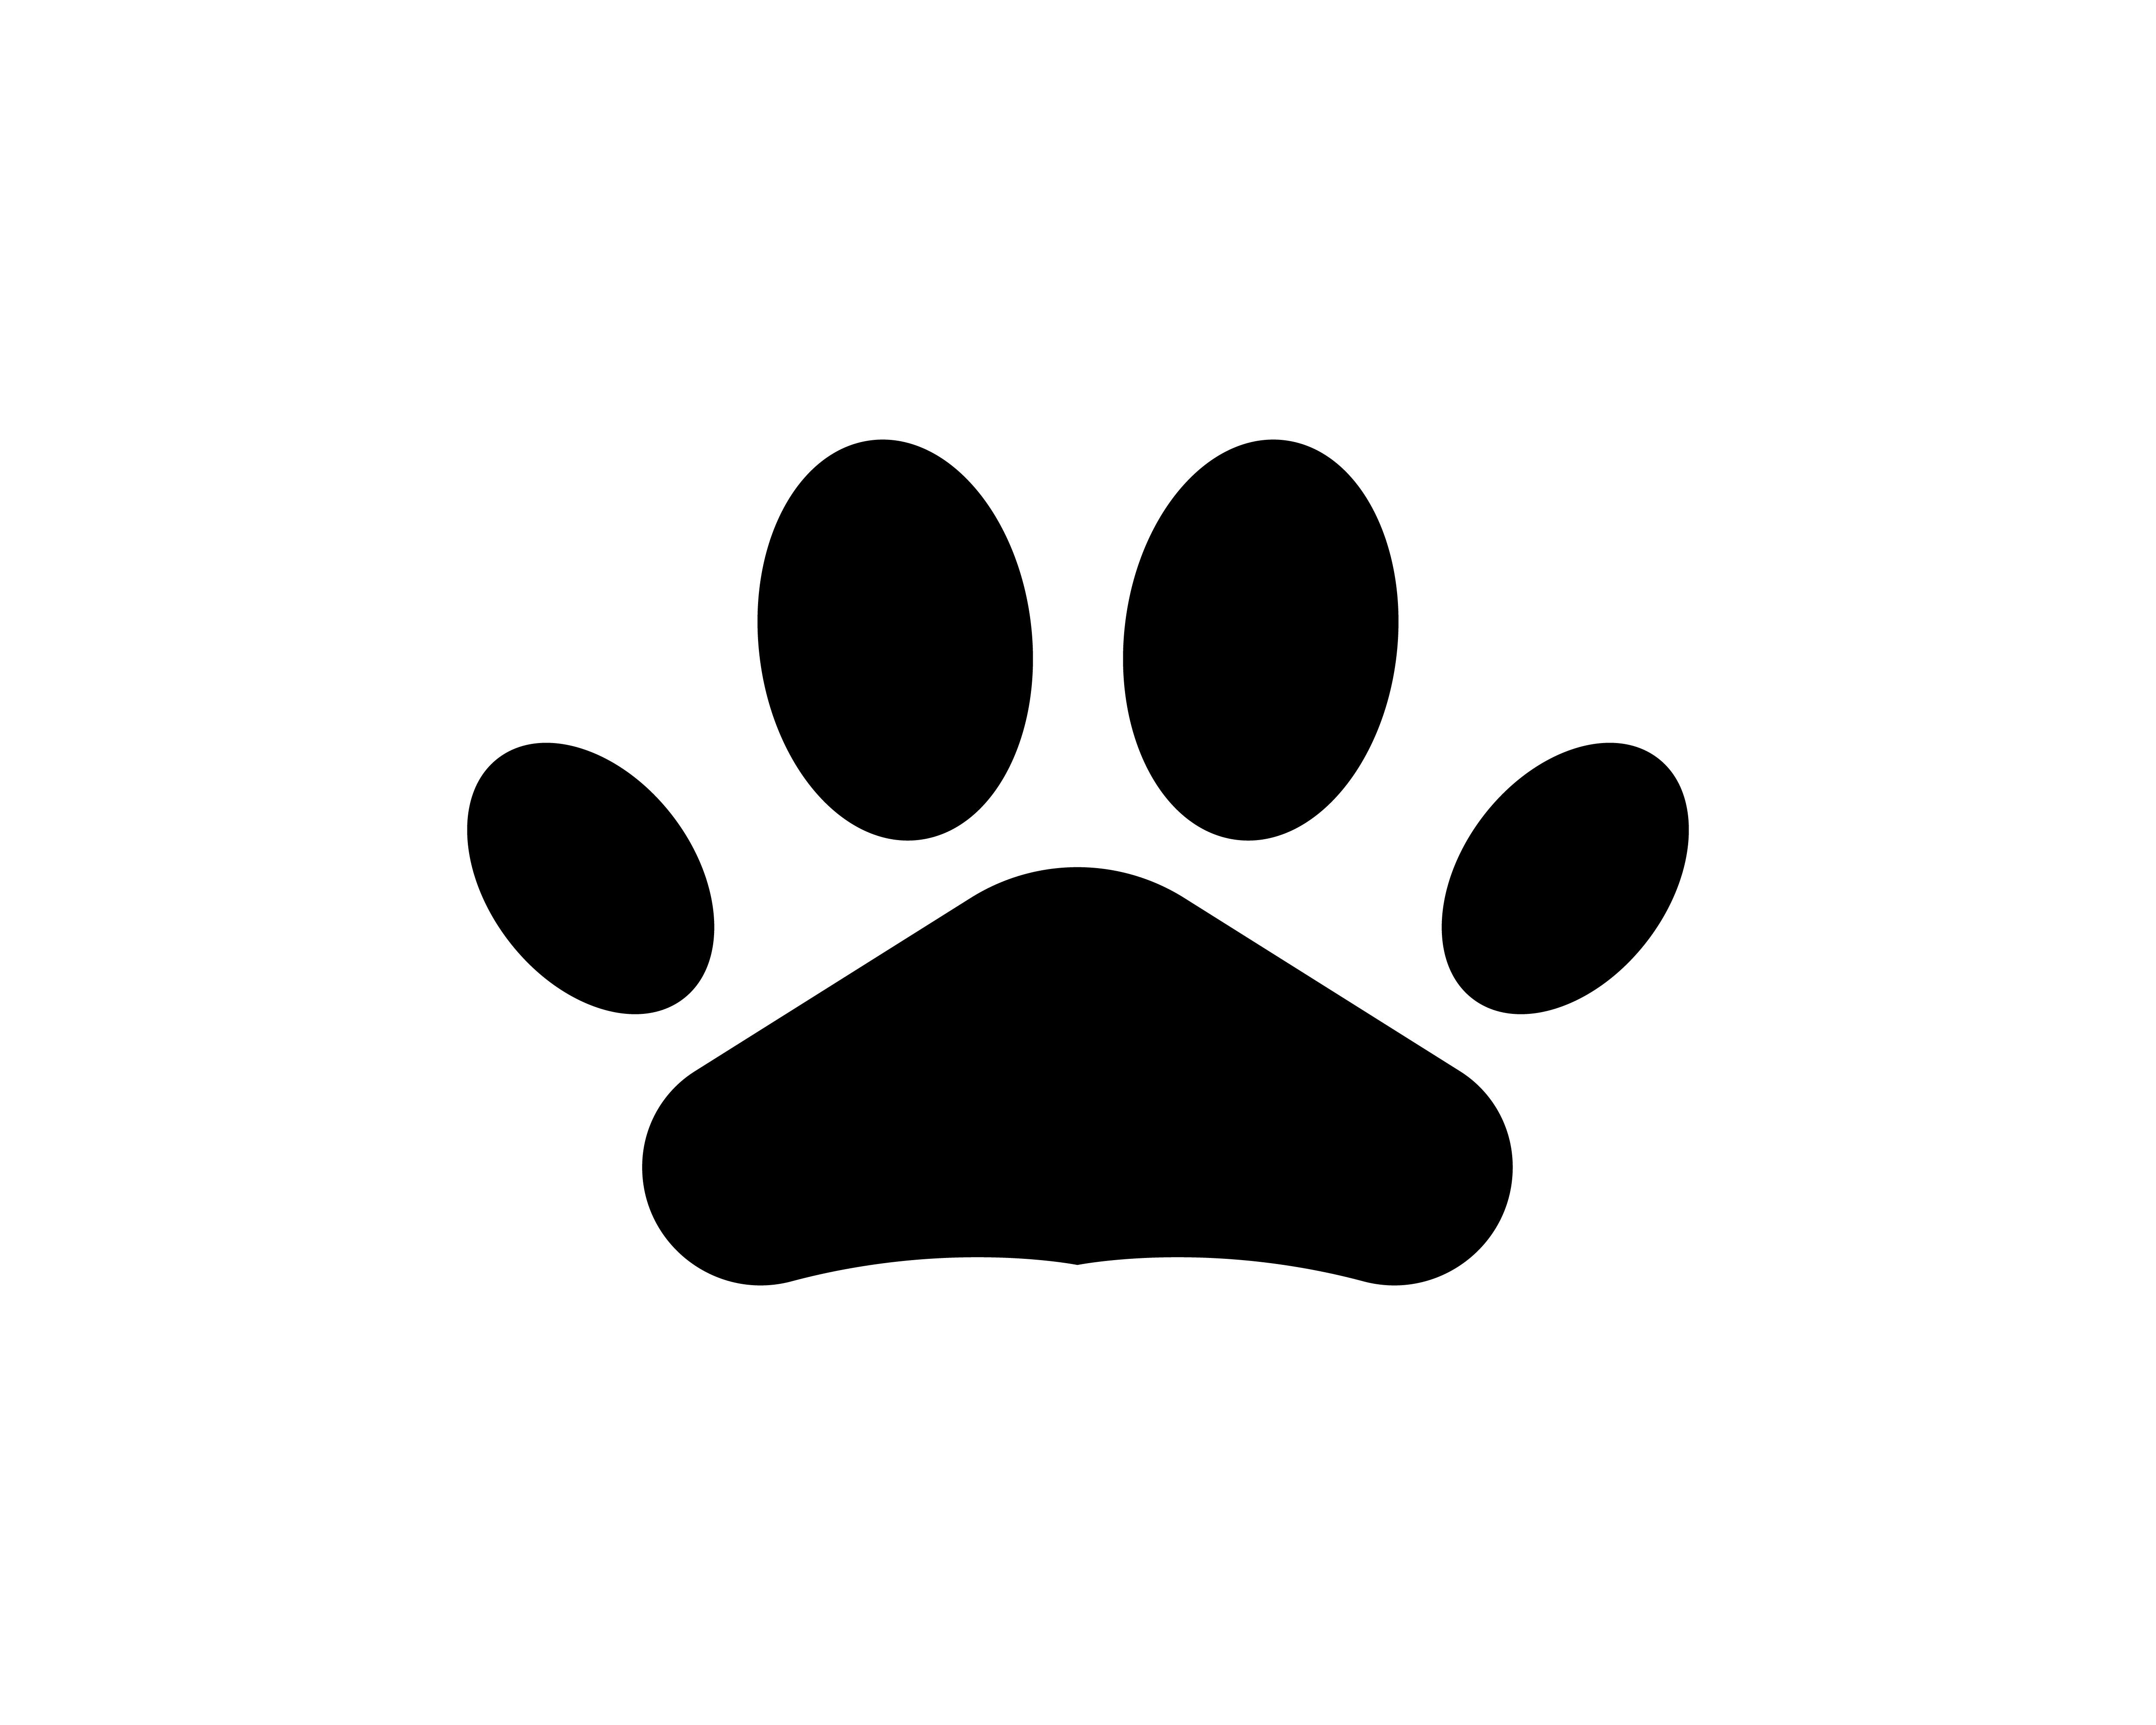 Foot print dog animal pet logo and symbols - Download Free ...